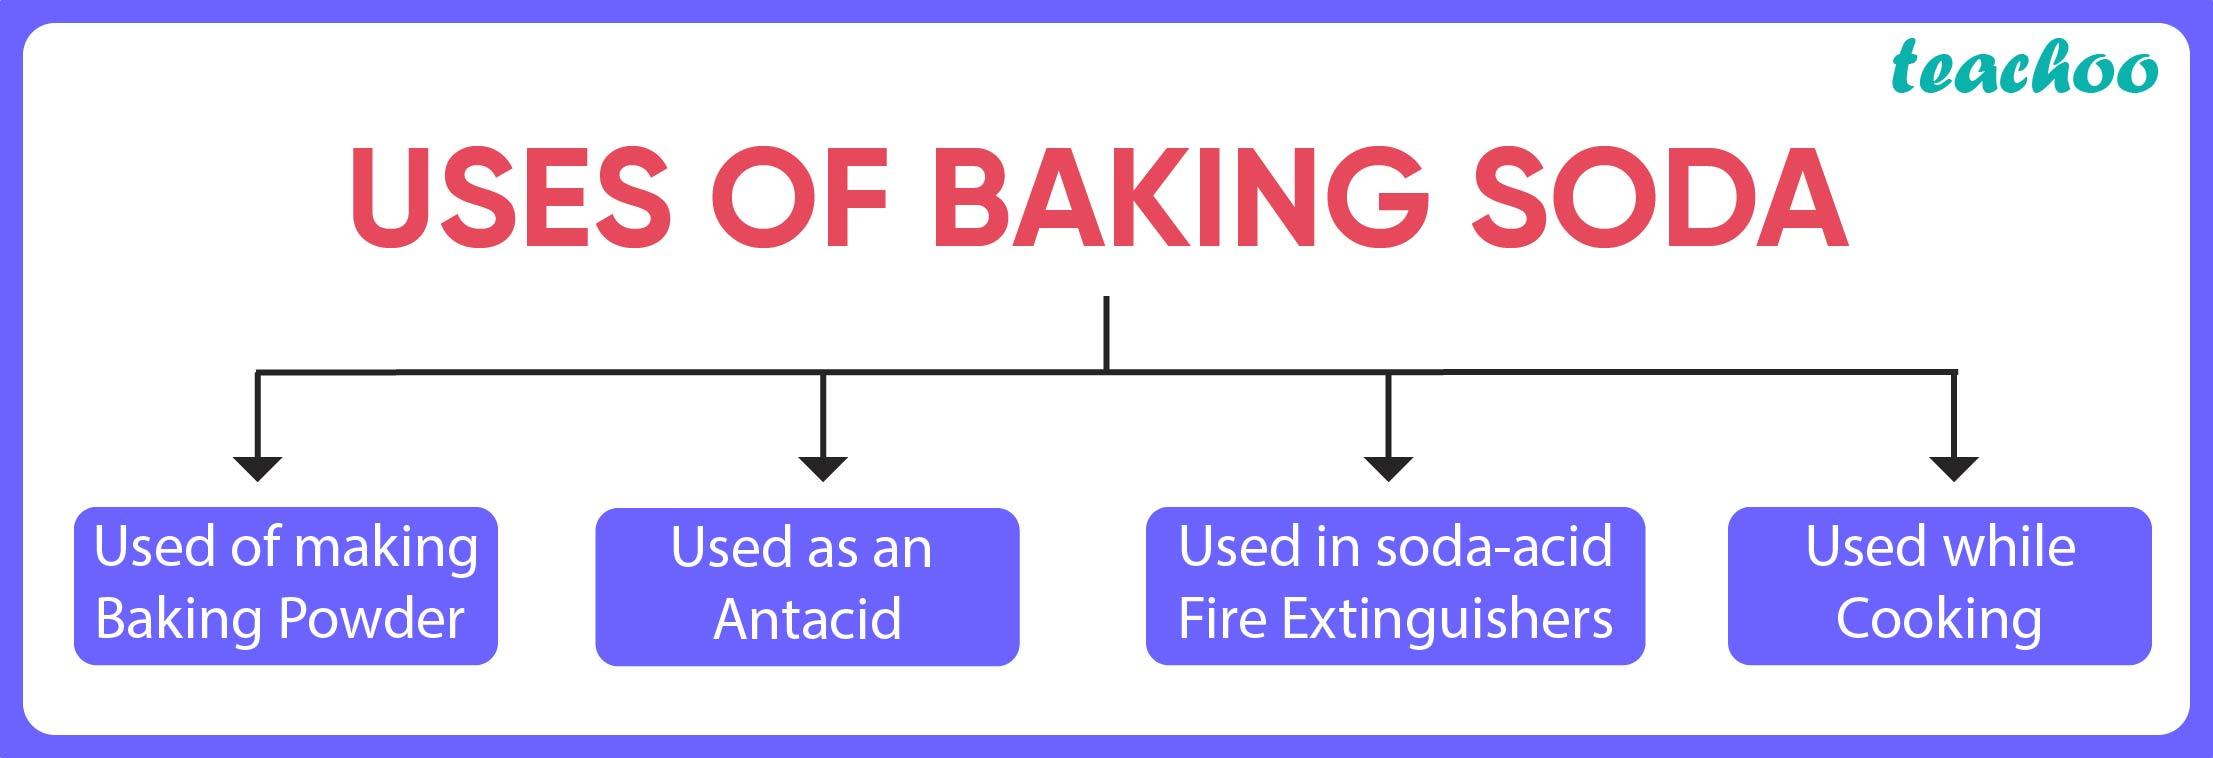 Uses of Baking Soda-Teachoo.jpg